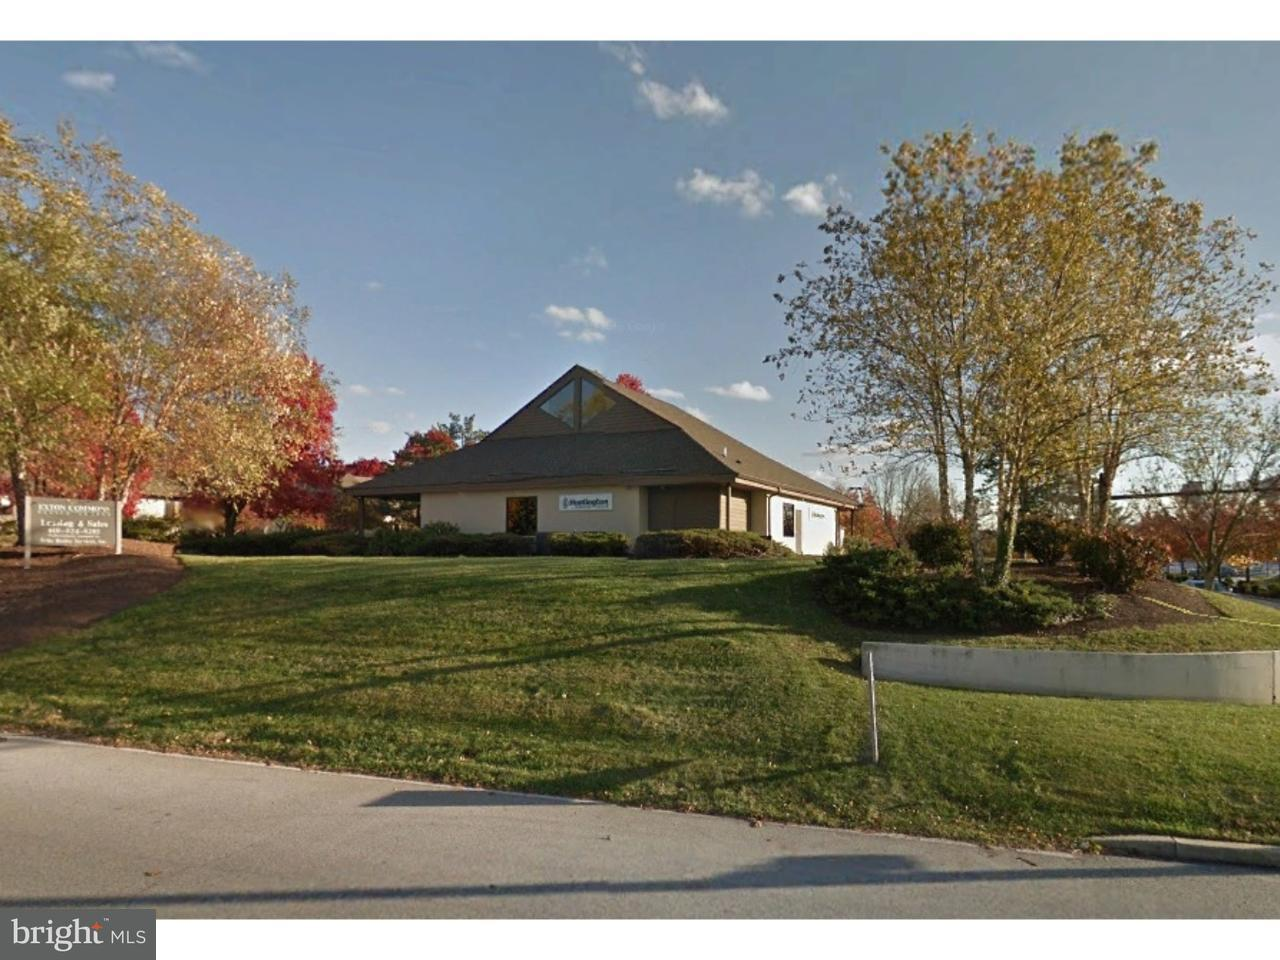 Single Family Home for Sale at 100 EXTON CMNS #74 Exton, Pennsylvania 19341 United States